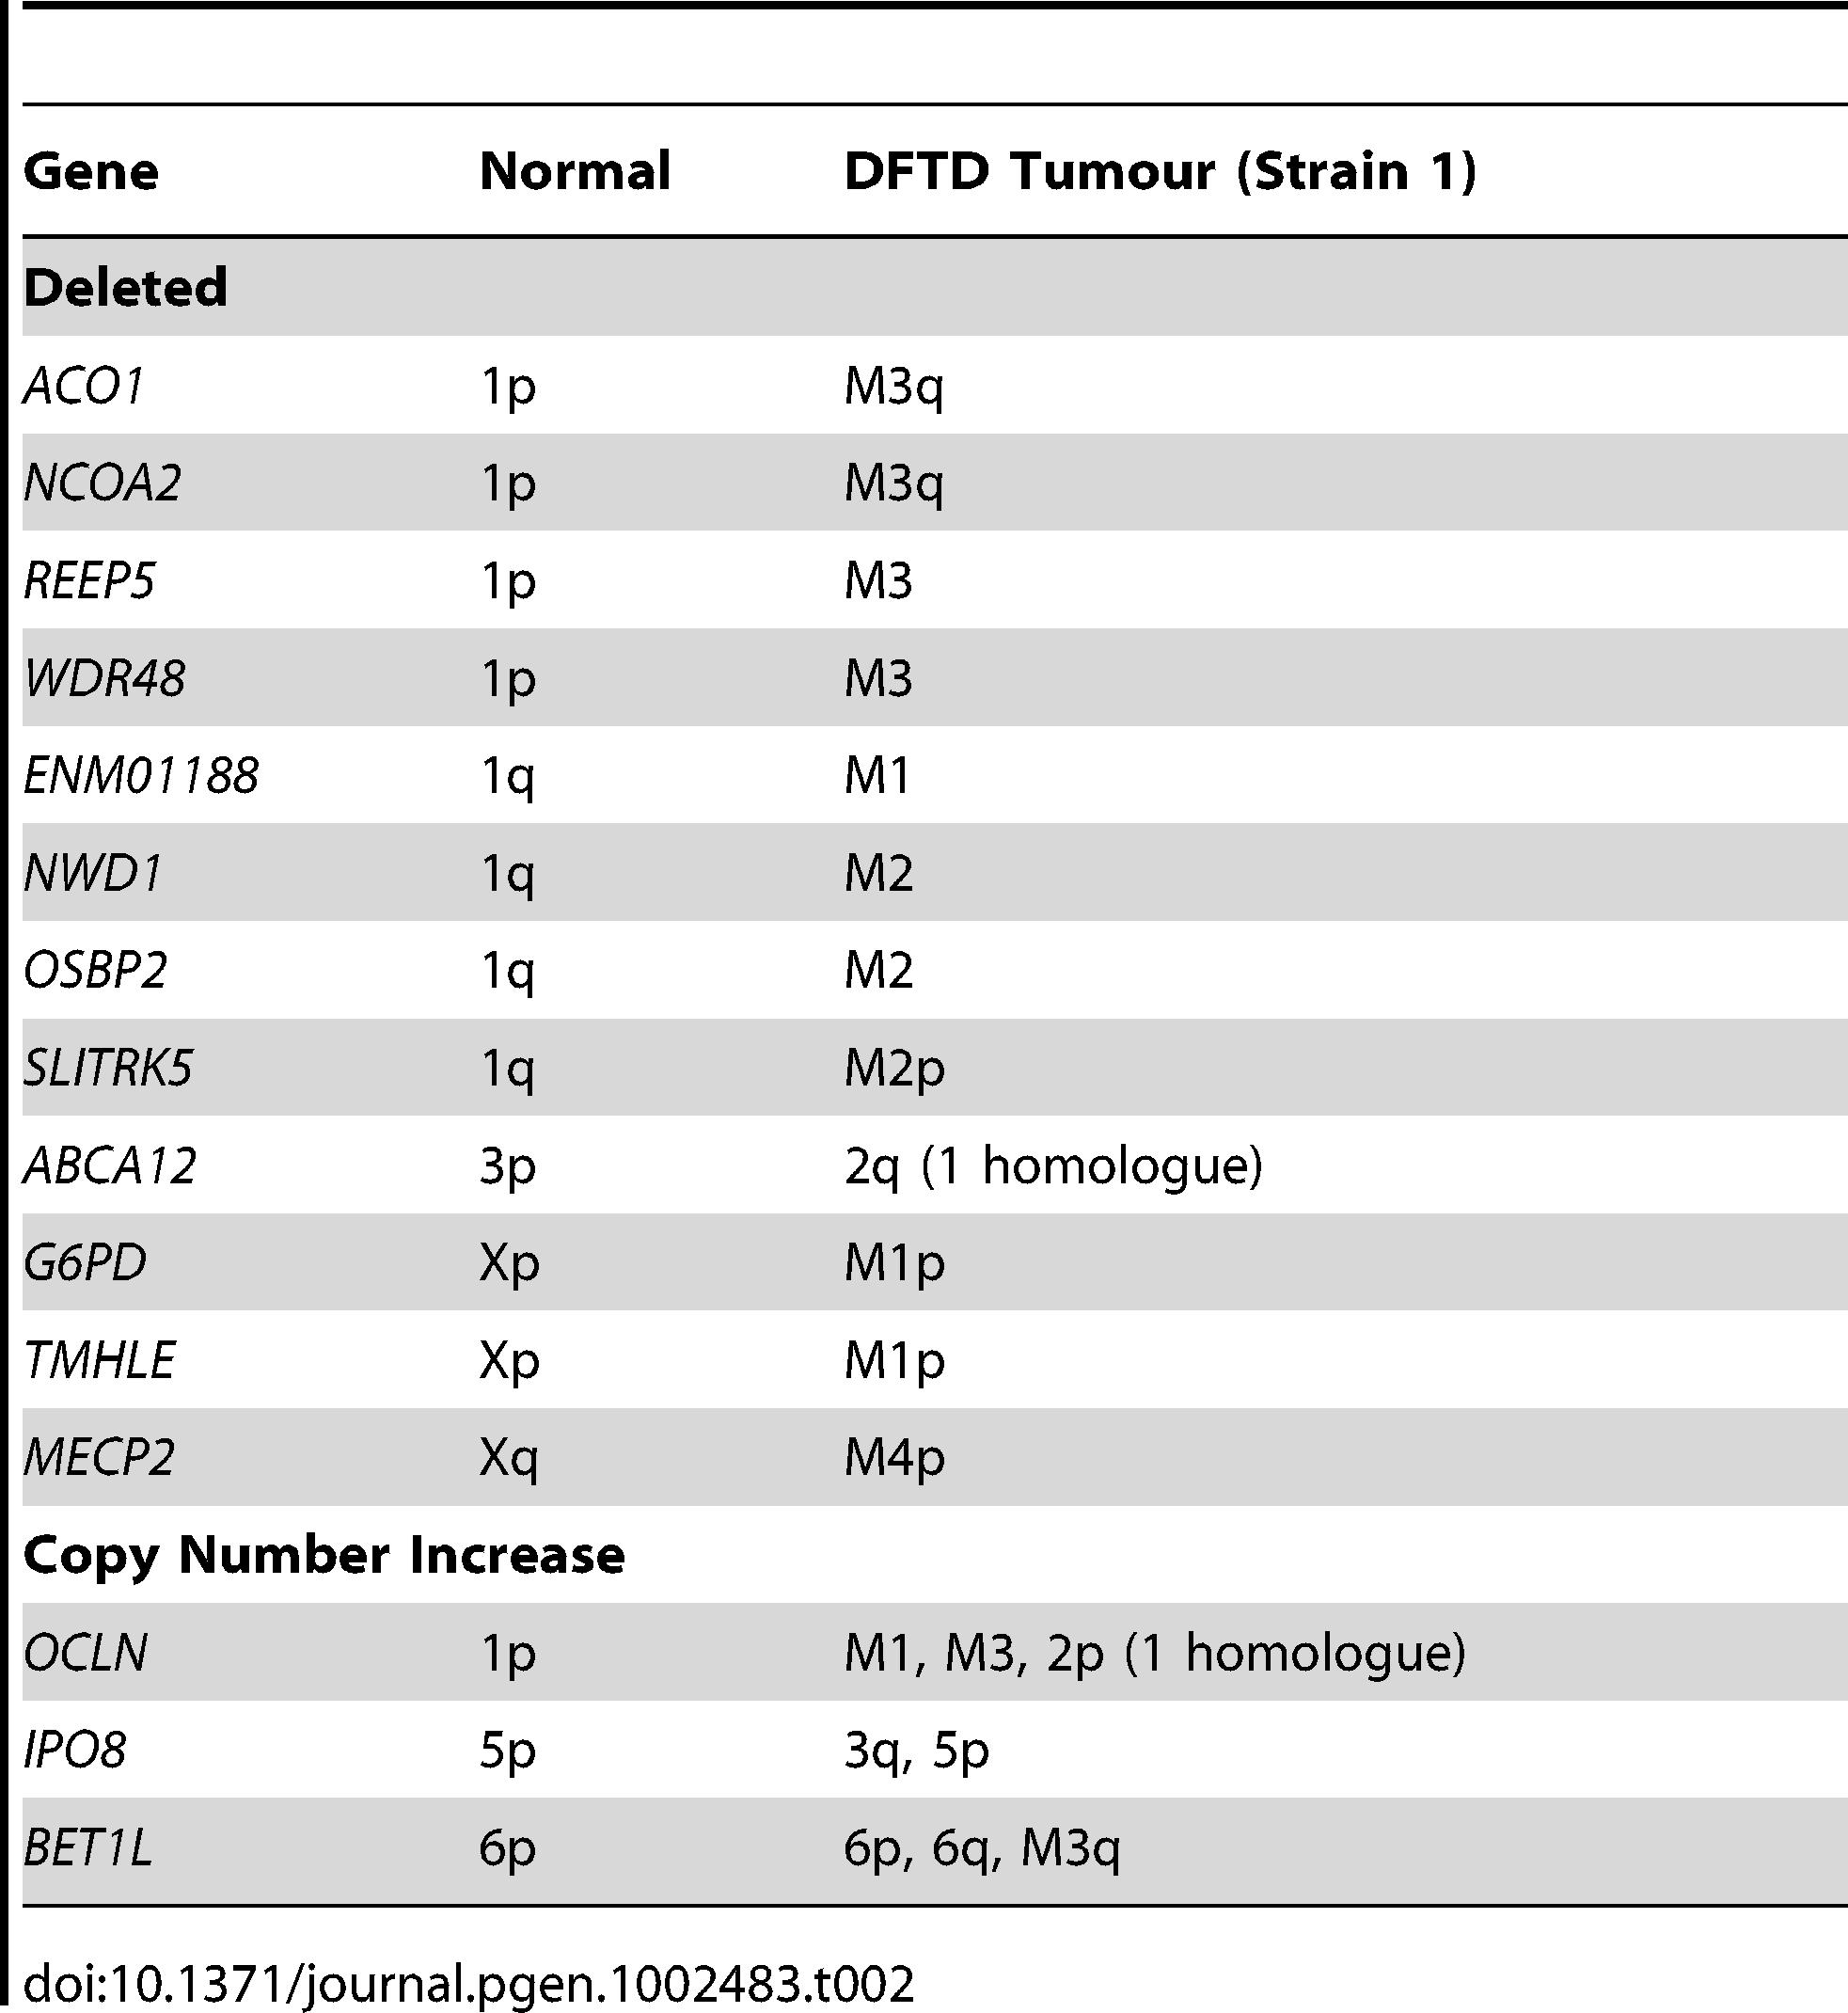 Genes deleted or increased in copy number in DFTD.